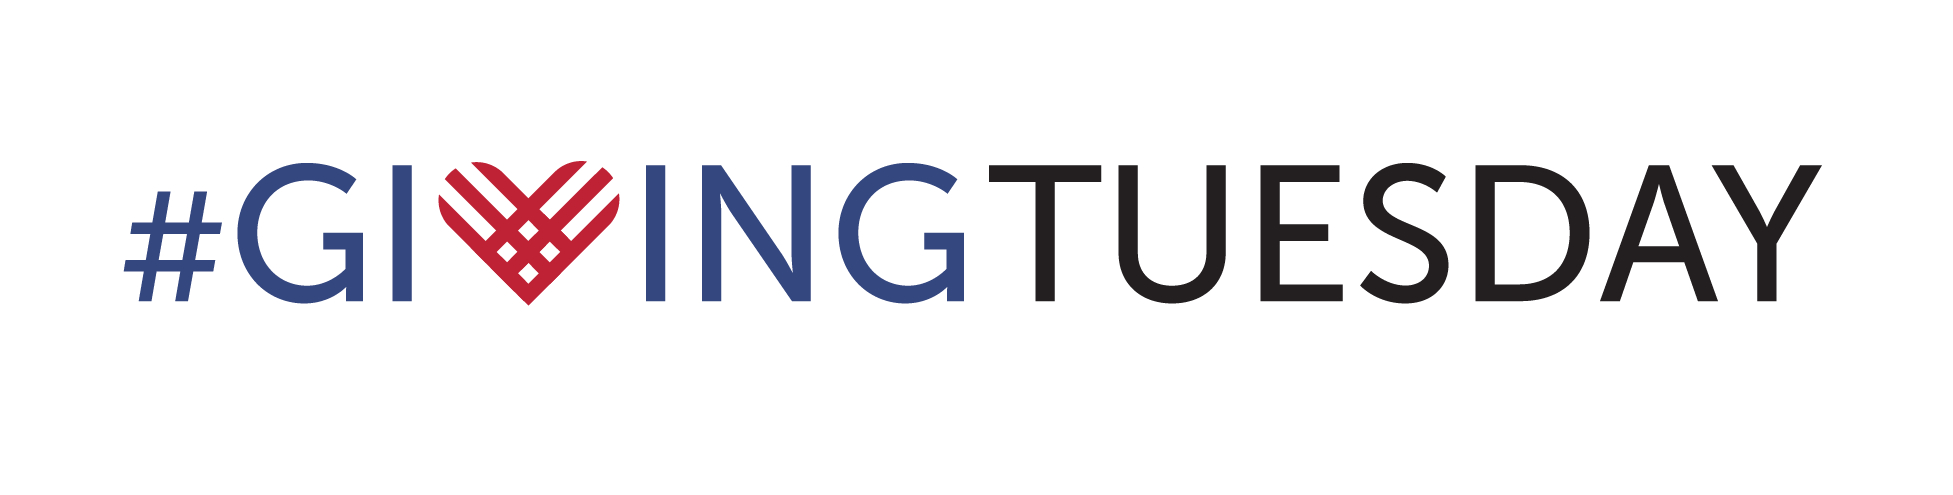 Giving_Tuesday_Logo.jpg